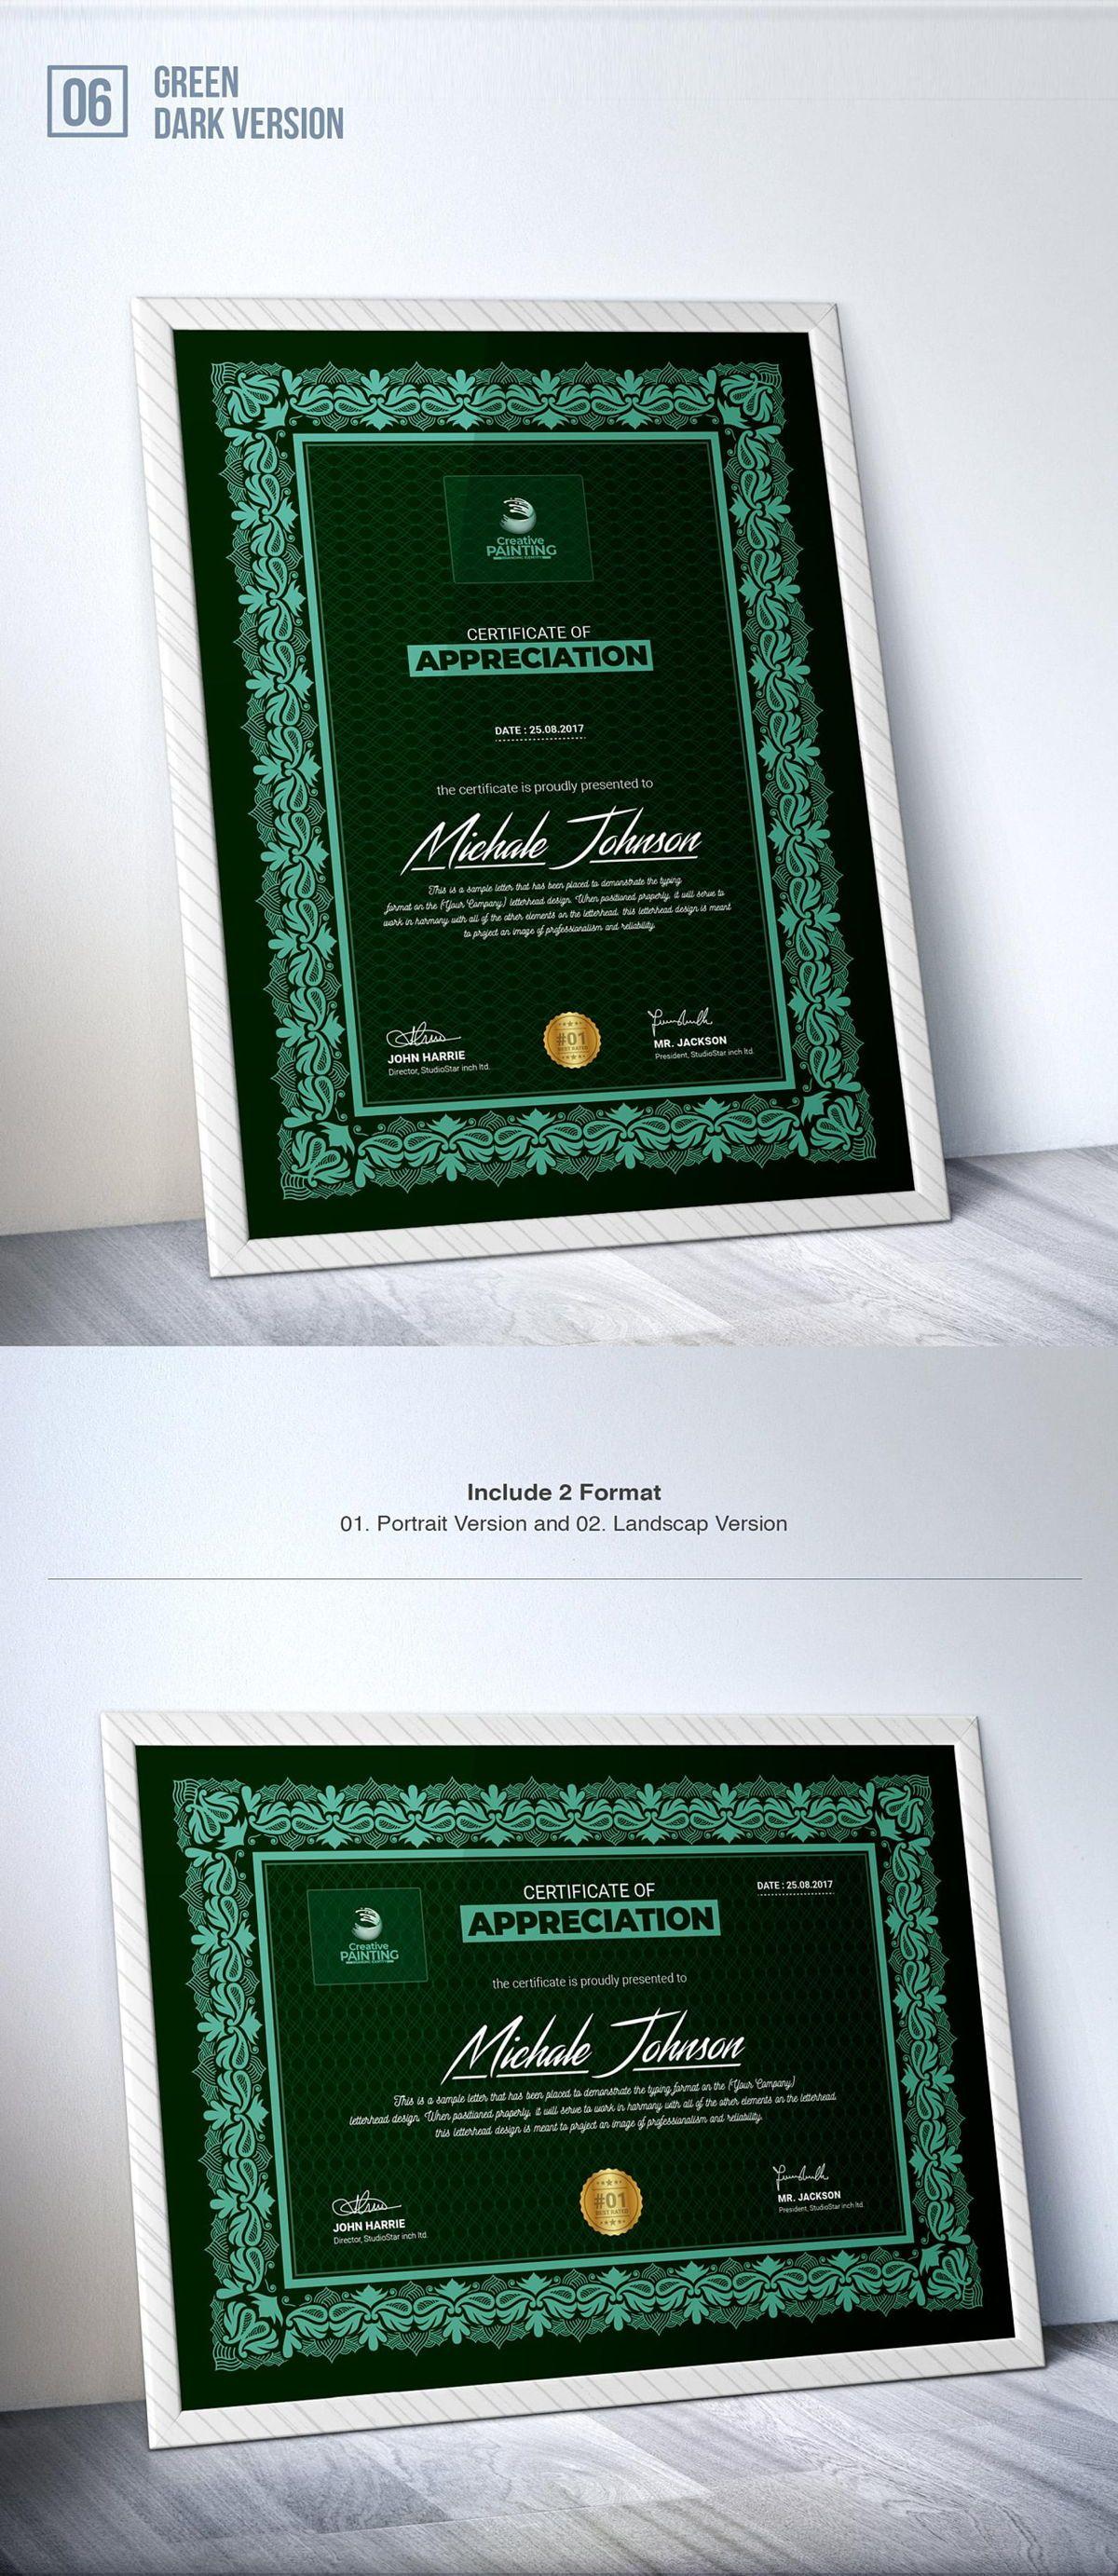 Creative Painting Certificate - 8 Colors - Dark and Light Version, Slide 8, 08755, Business — PoweredTemplate.com